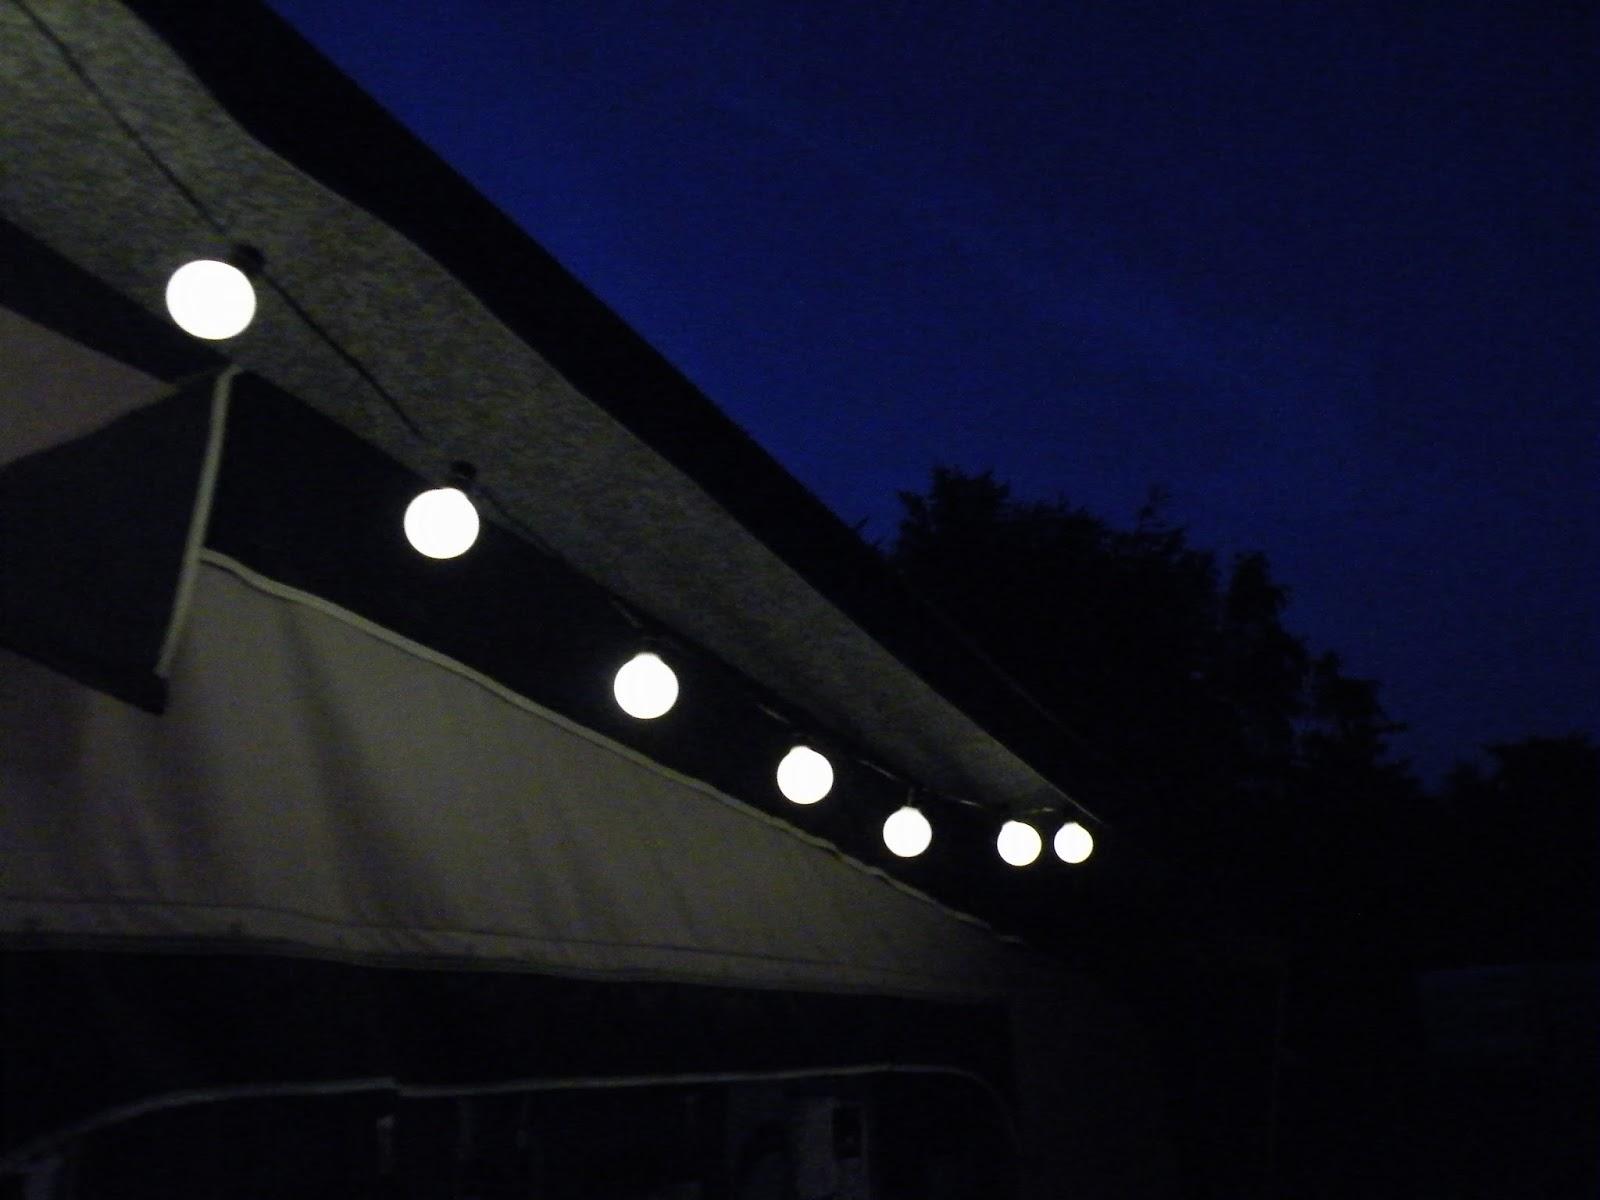 Lampen Op Zonnecellen : Genoeg lampen op zonne energie ikea vqq agneswamu